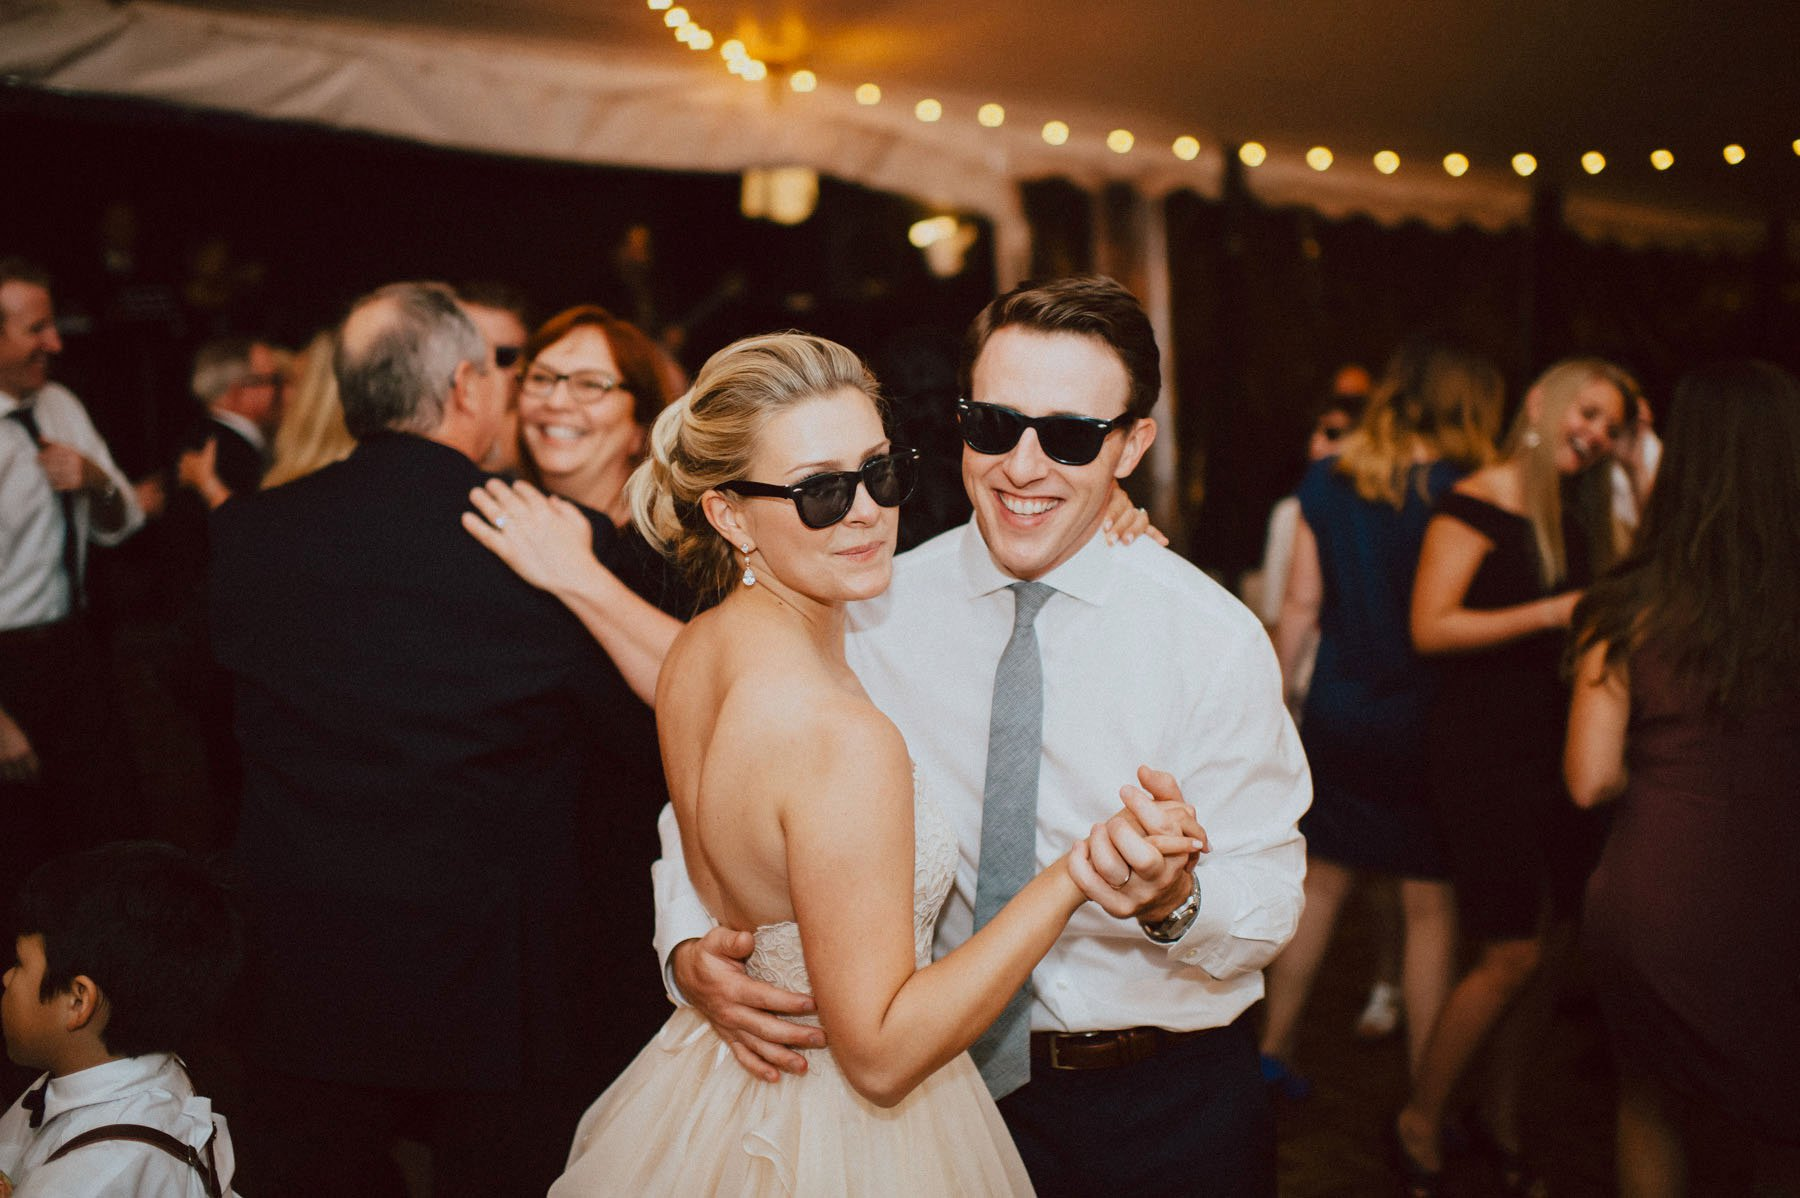 greenville-country-club-wedding-155.jpg